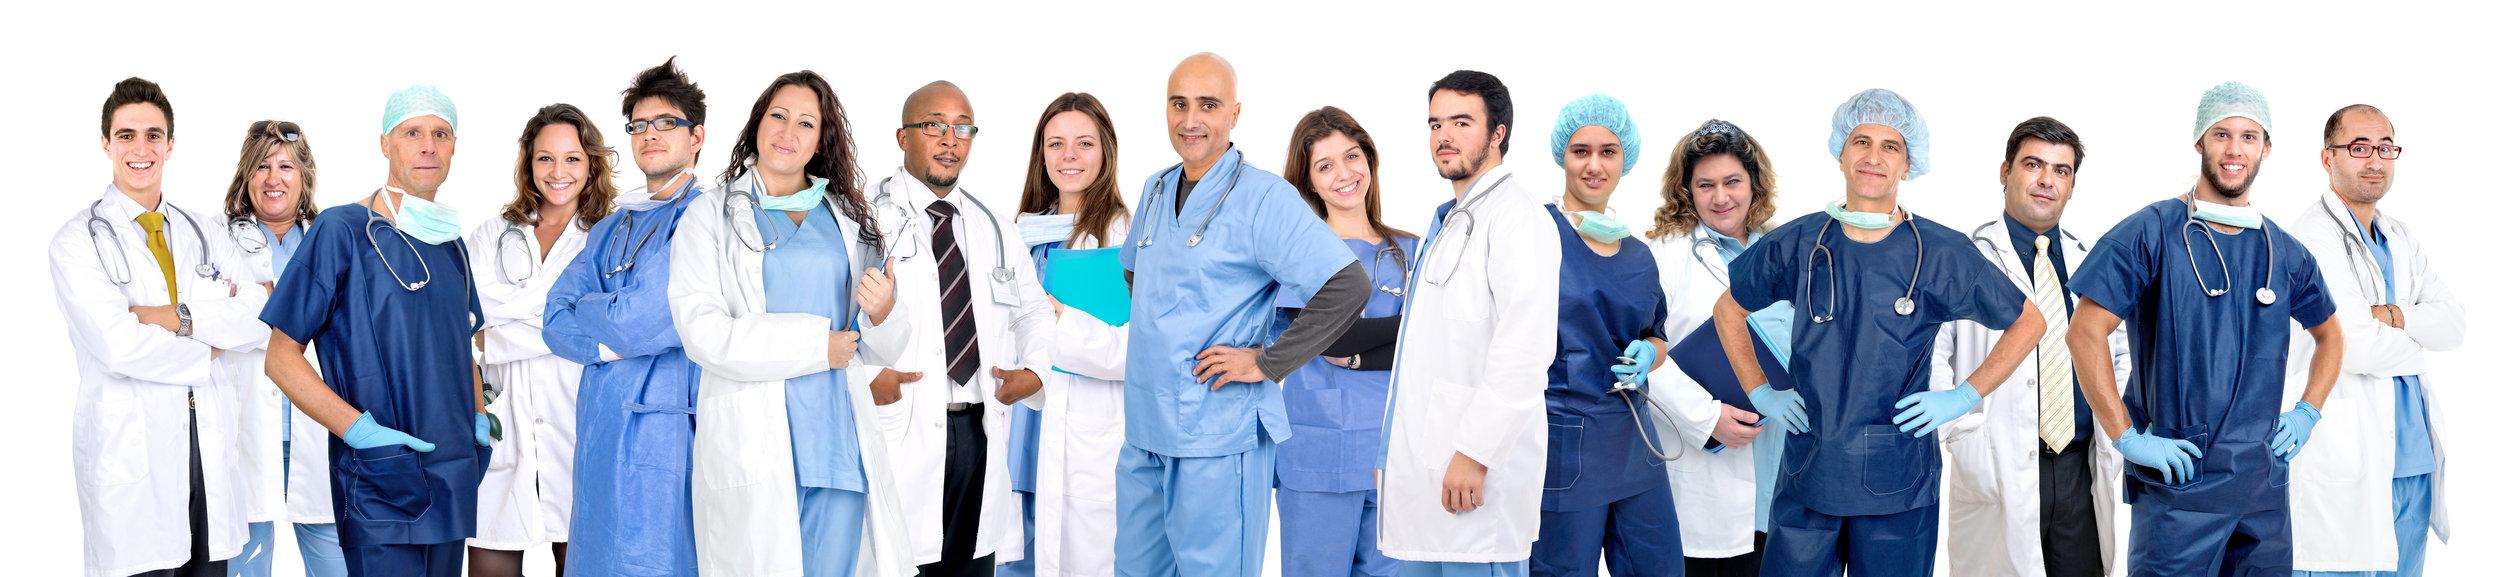 medical staff.jpeg